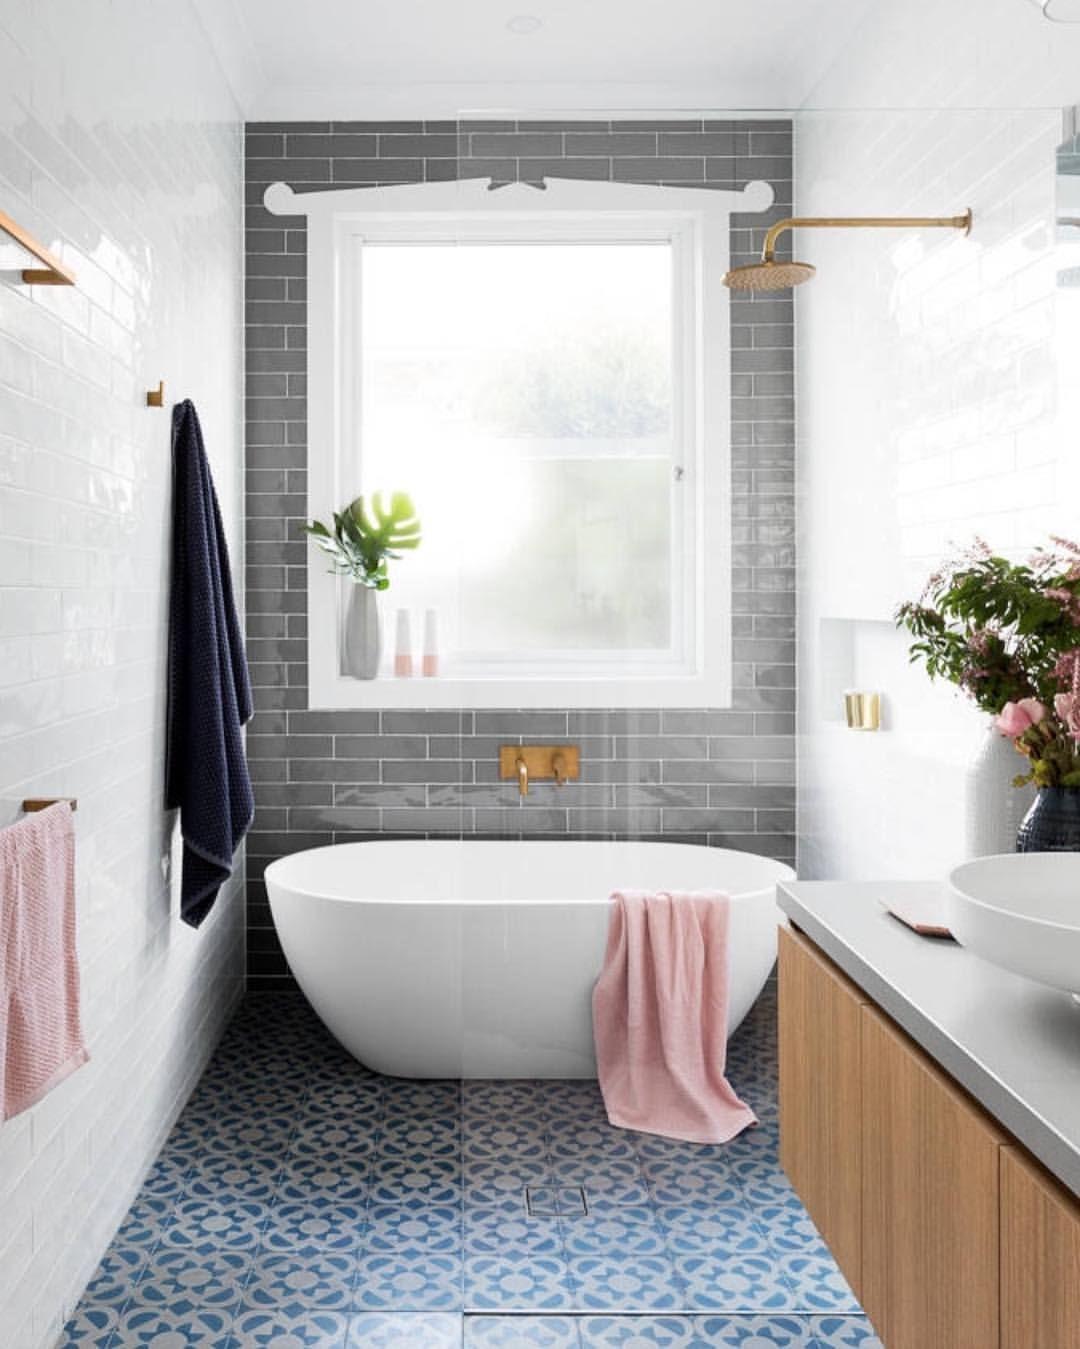 Combined Tub Shower Combo Heminredning Stilar Badrumsrenovering